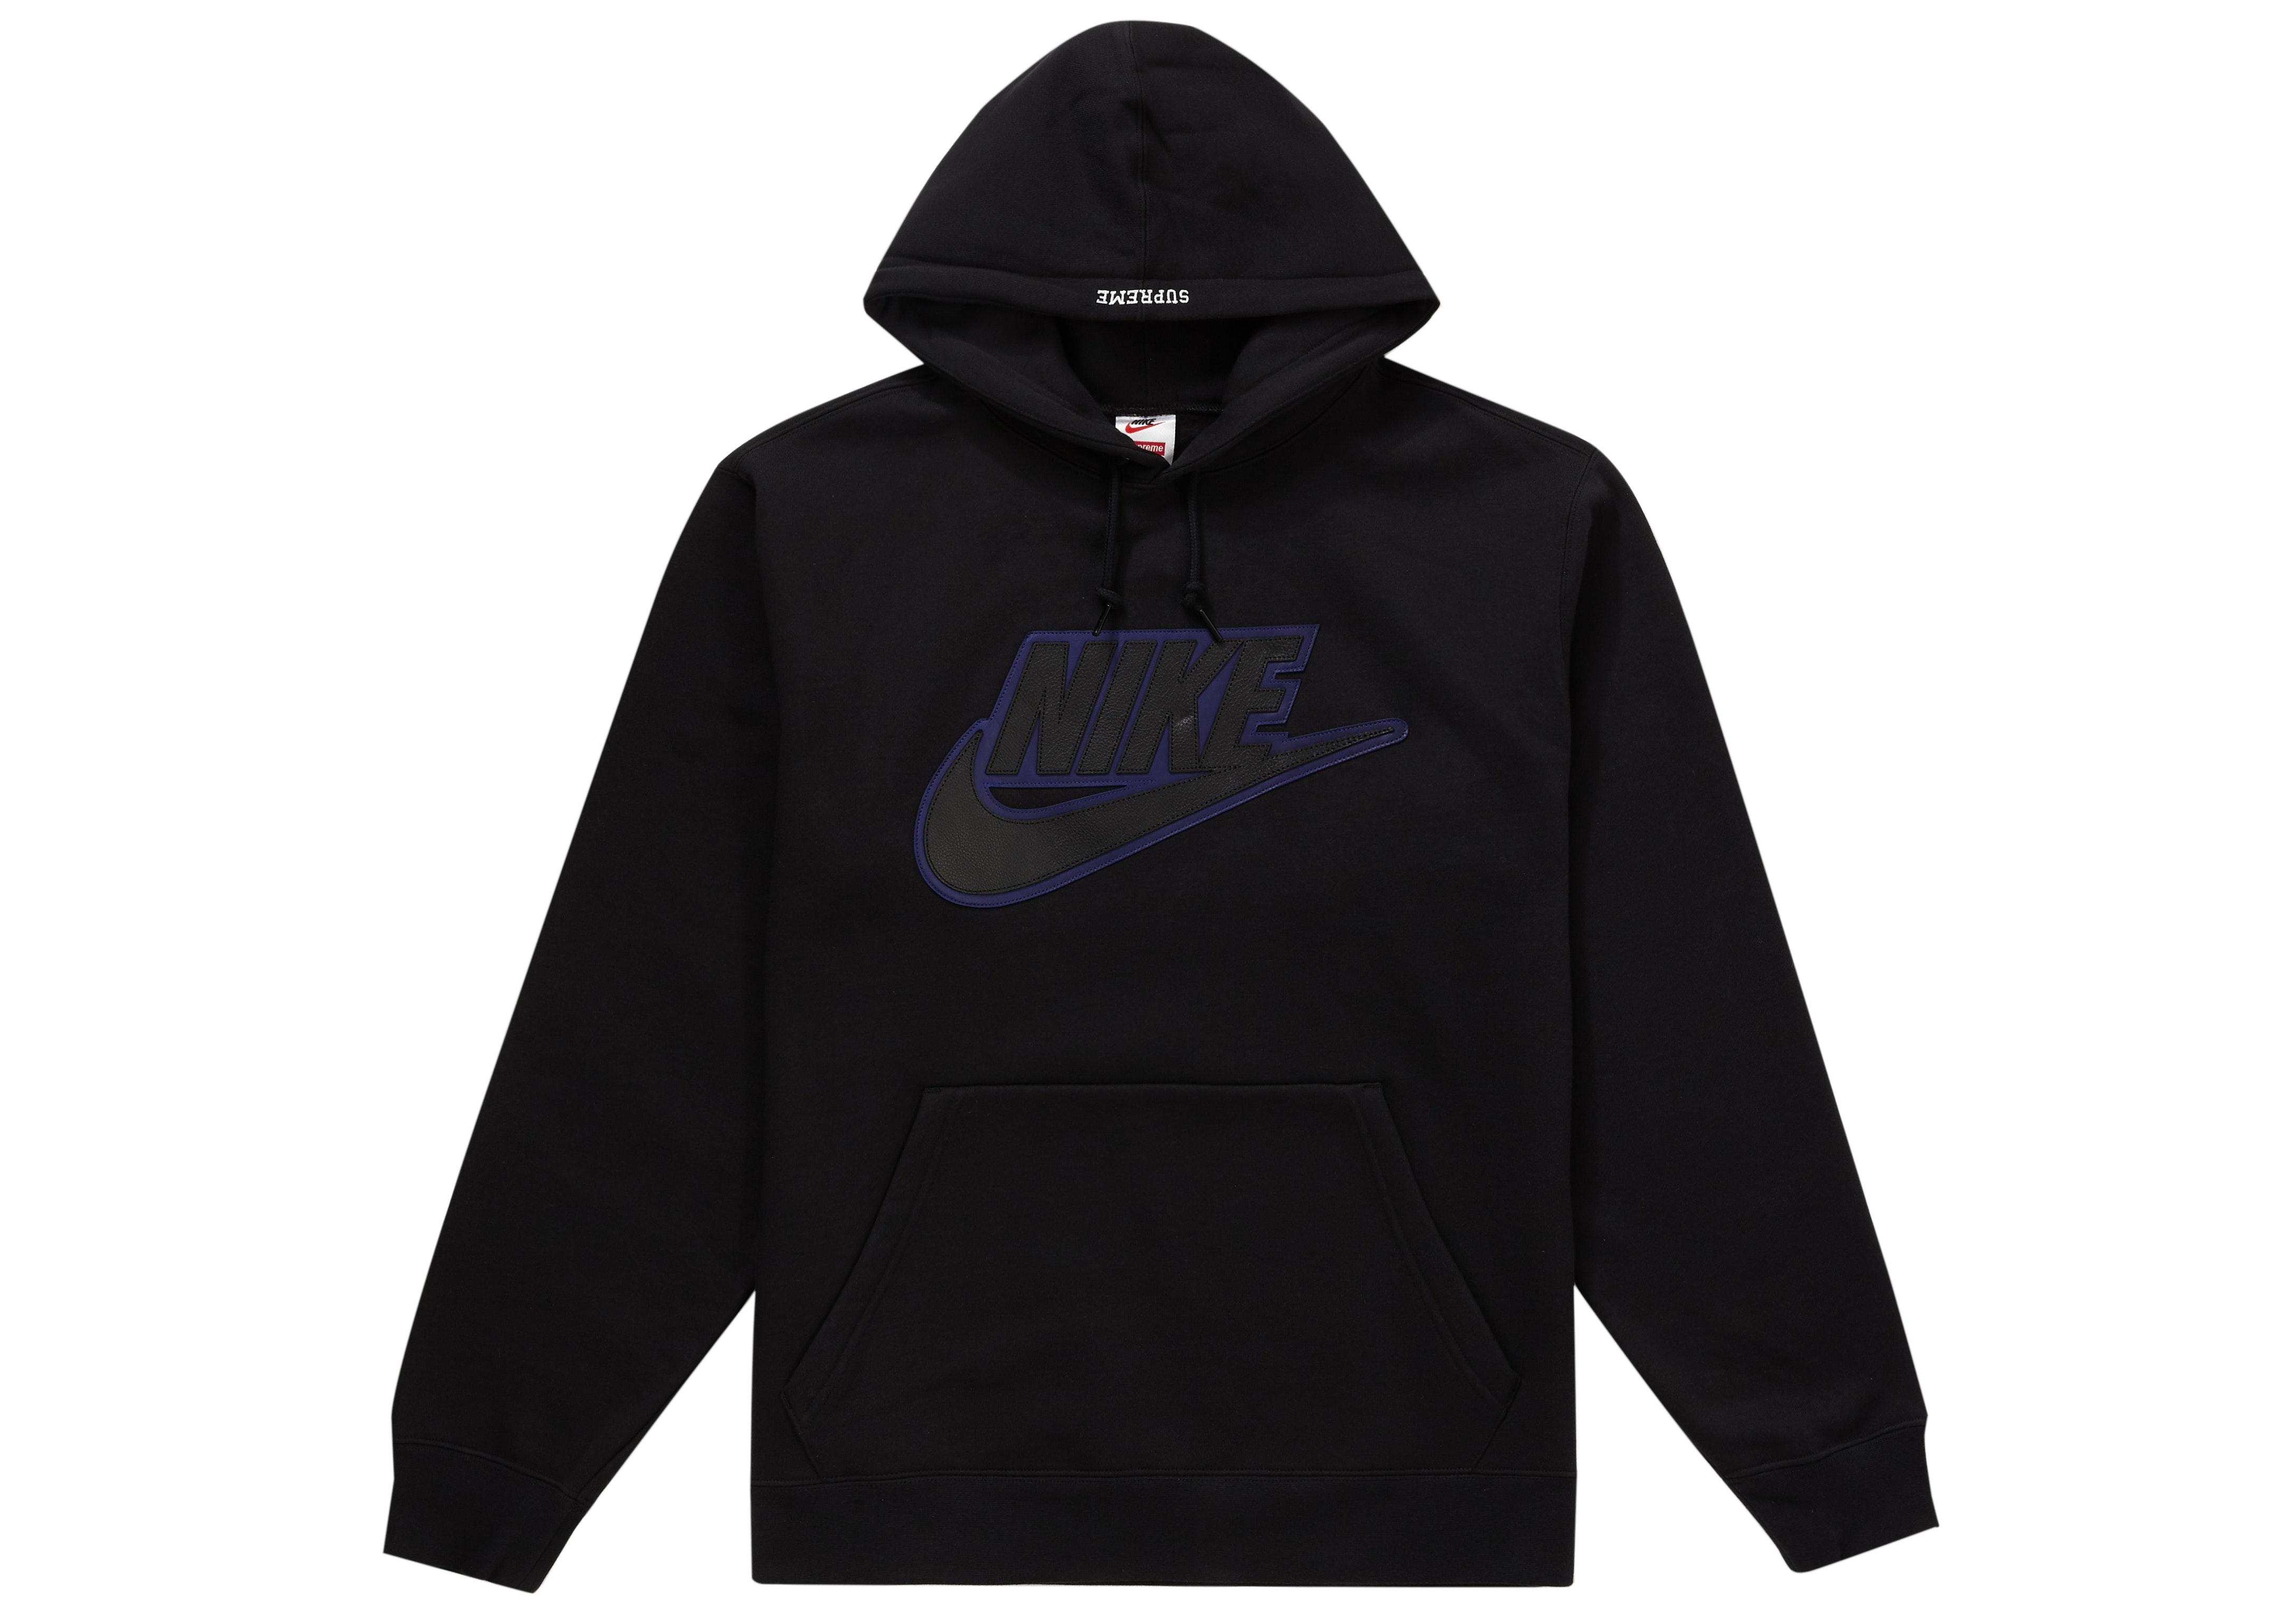 Supreme Nike Leather Applique Hooded Sweatshirt Black